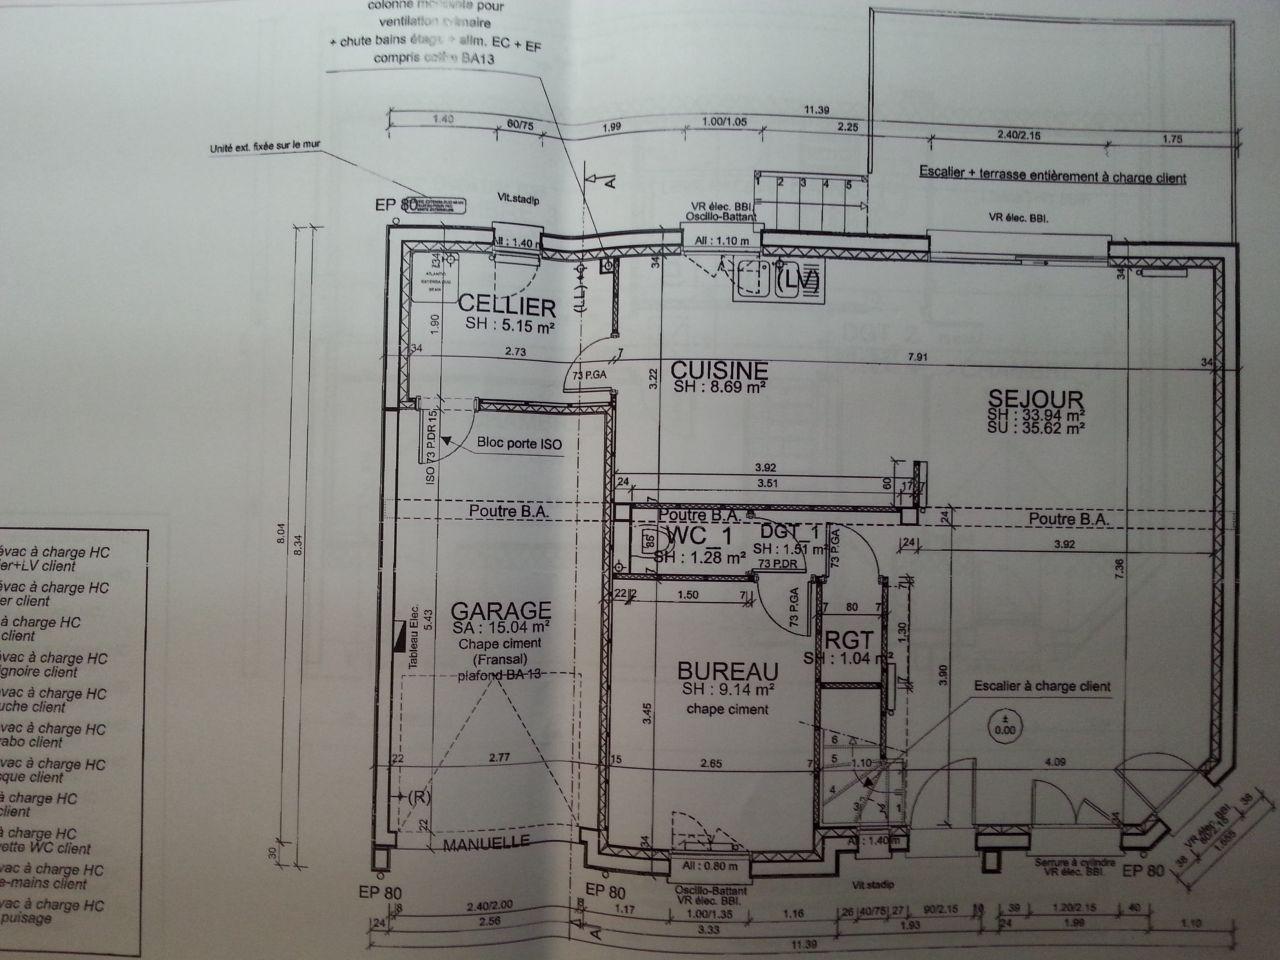 projet de notre futur nid douillet la construction de. Black Bedroom Furniture Sets. Home Design Ideas